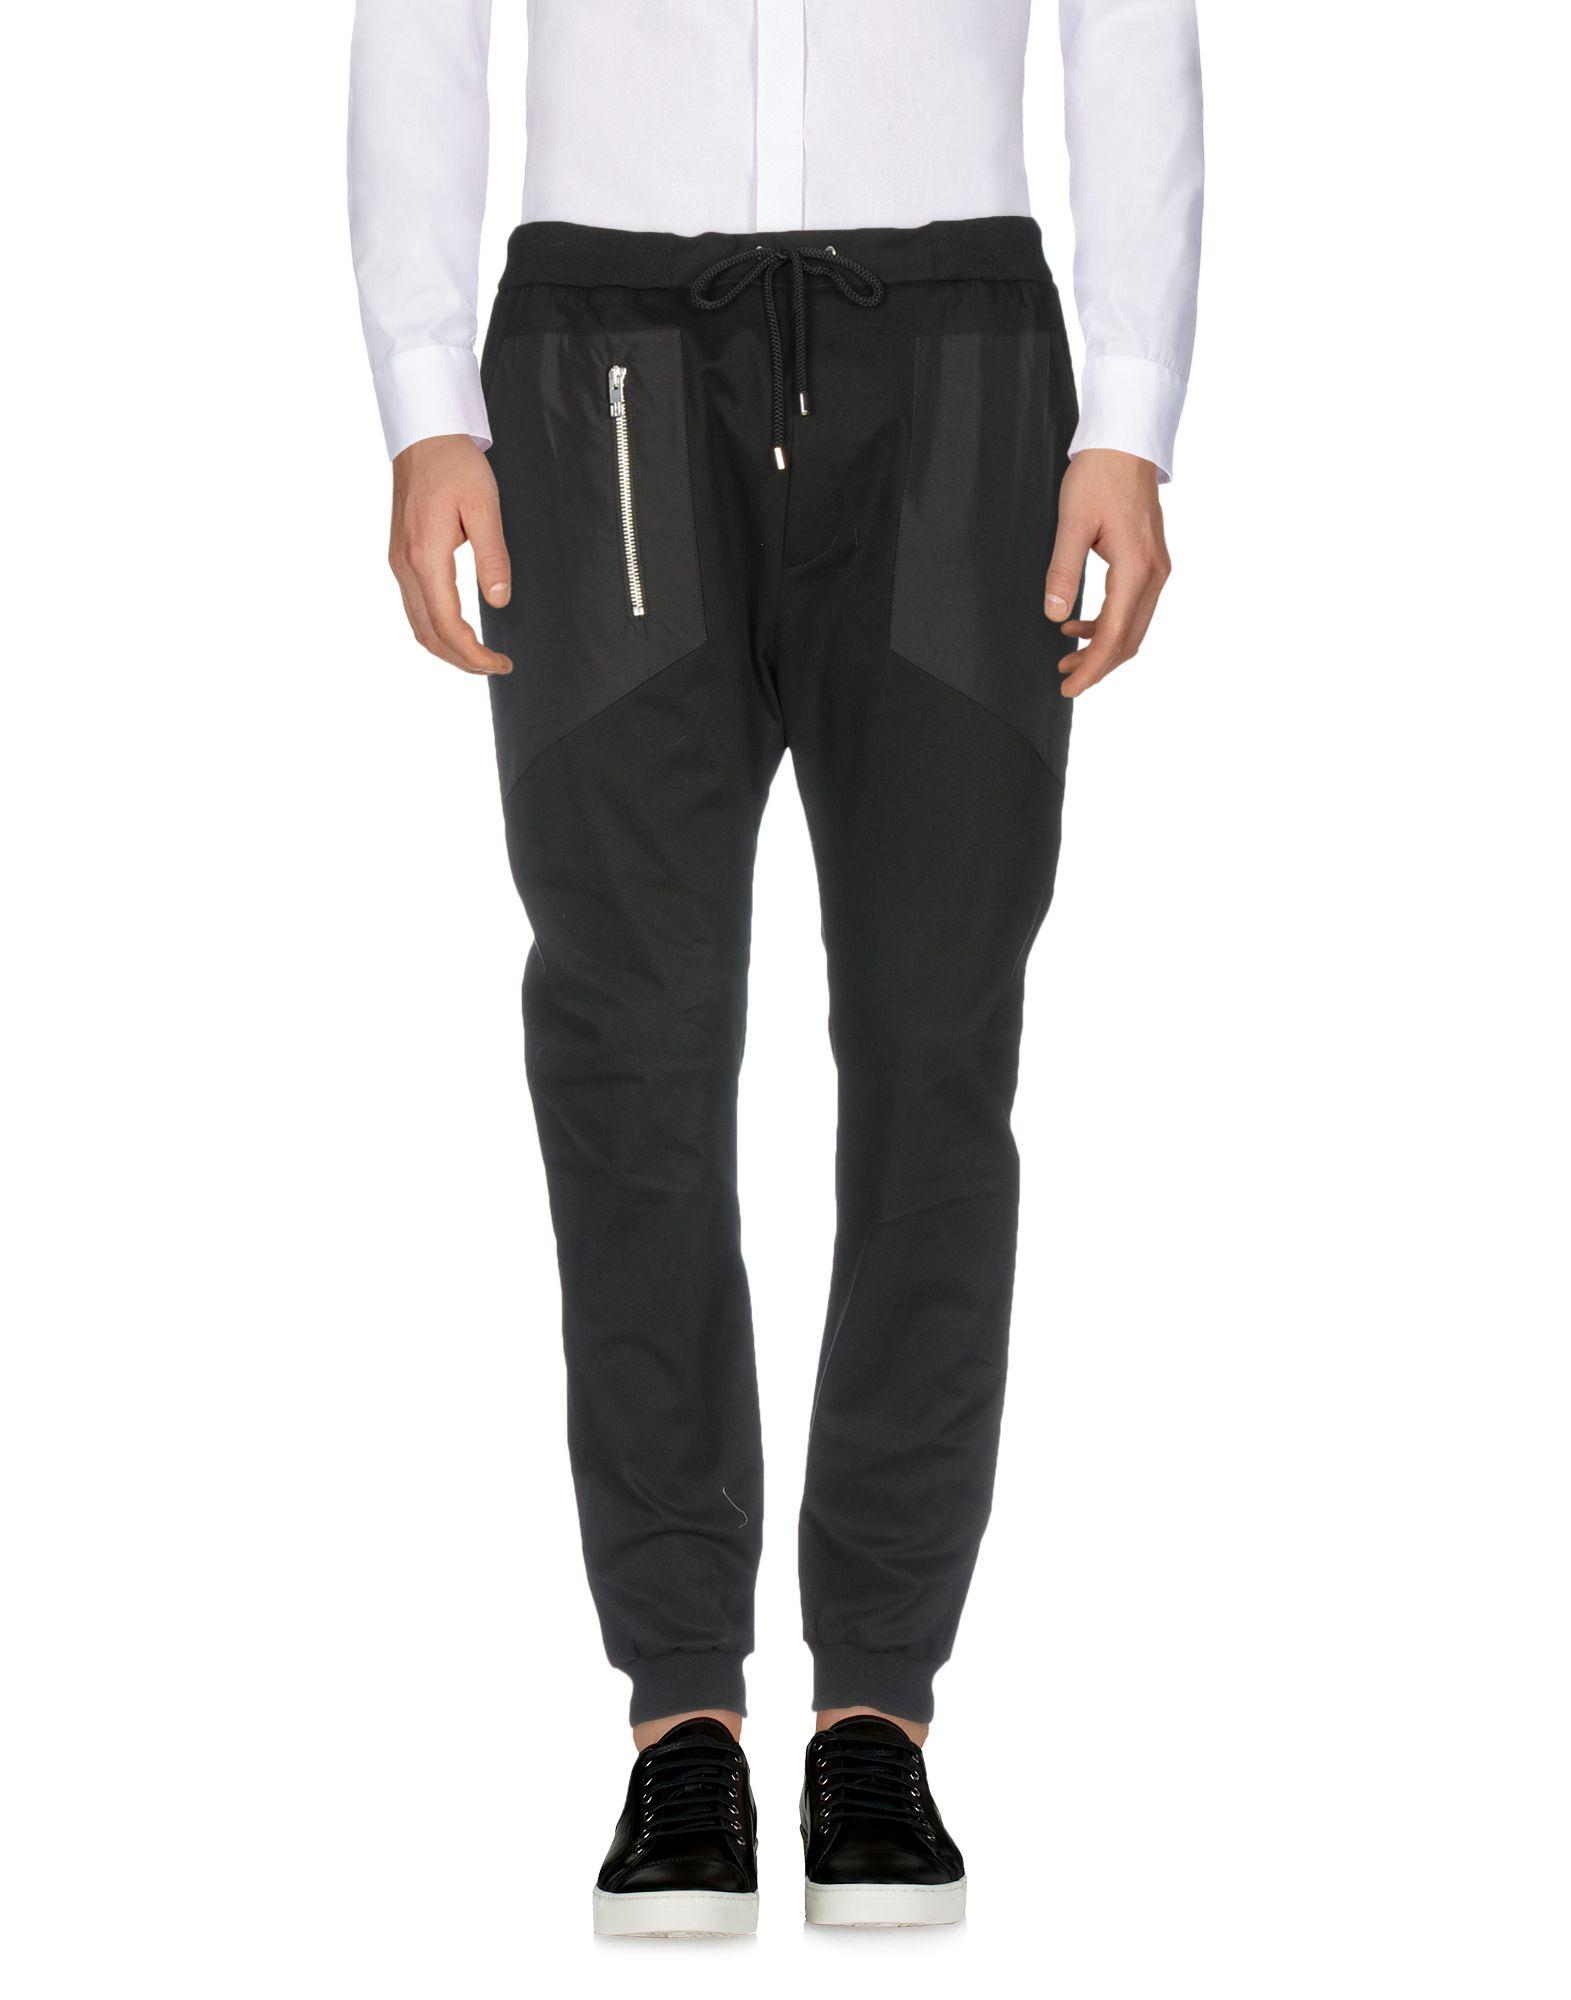 Pantalone Urban Les Hommes Donna - Acquista online su